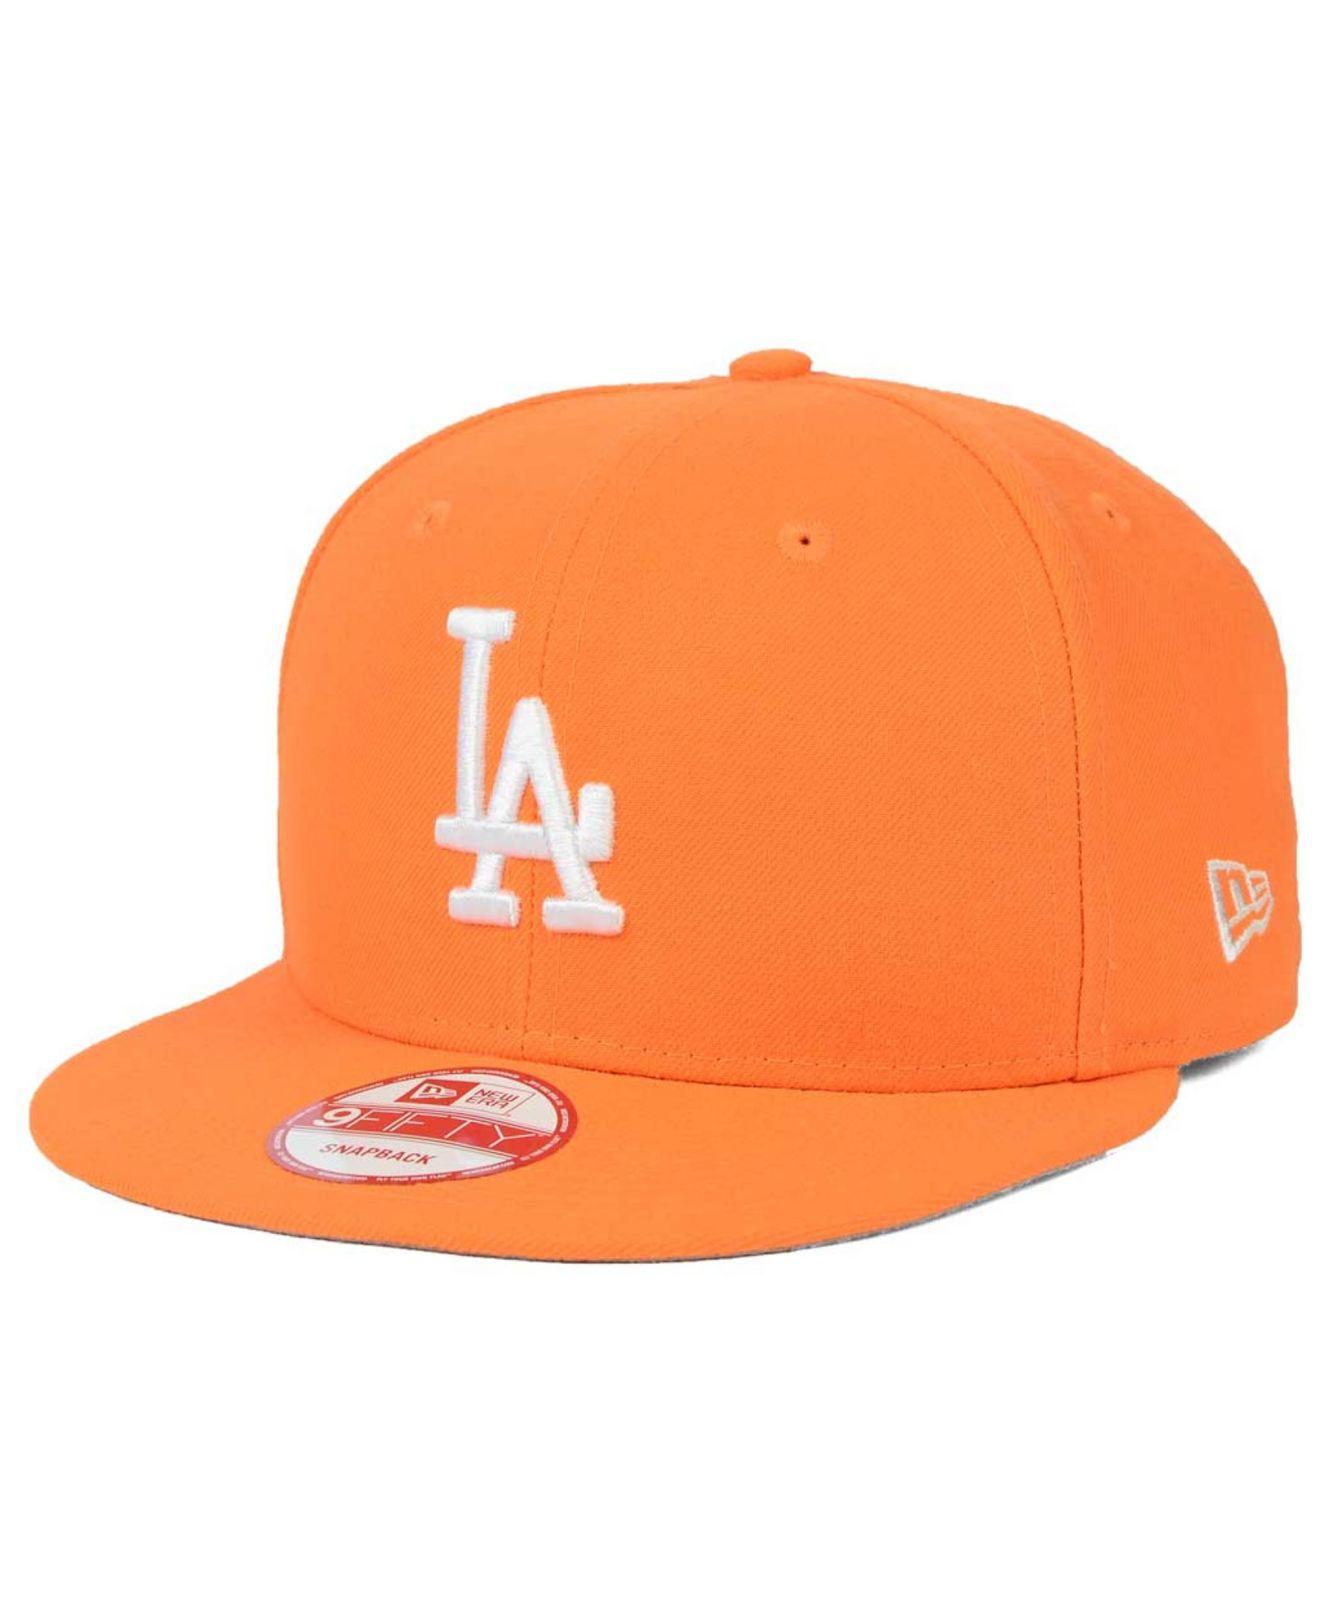 ... authentic lyst ktz los angeles dodgers c dub 9fifty snapback cap in  orange 2fcfe 27640 8a44c146b73